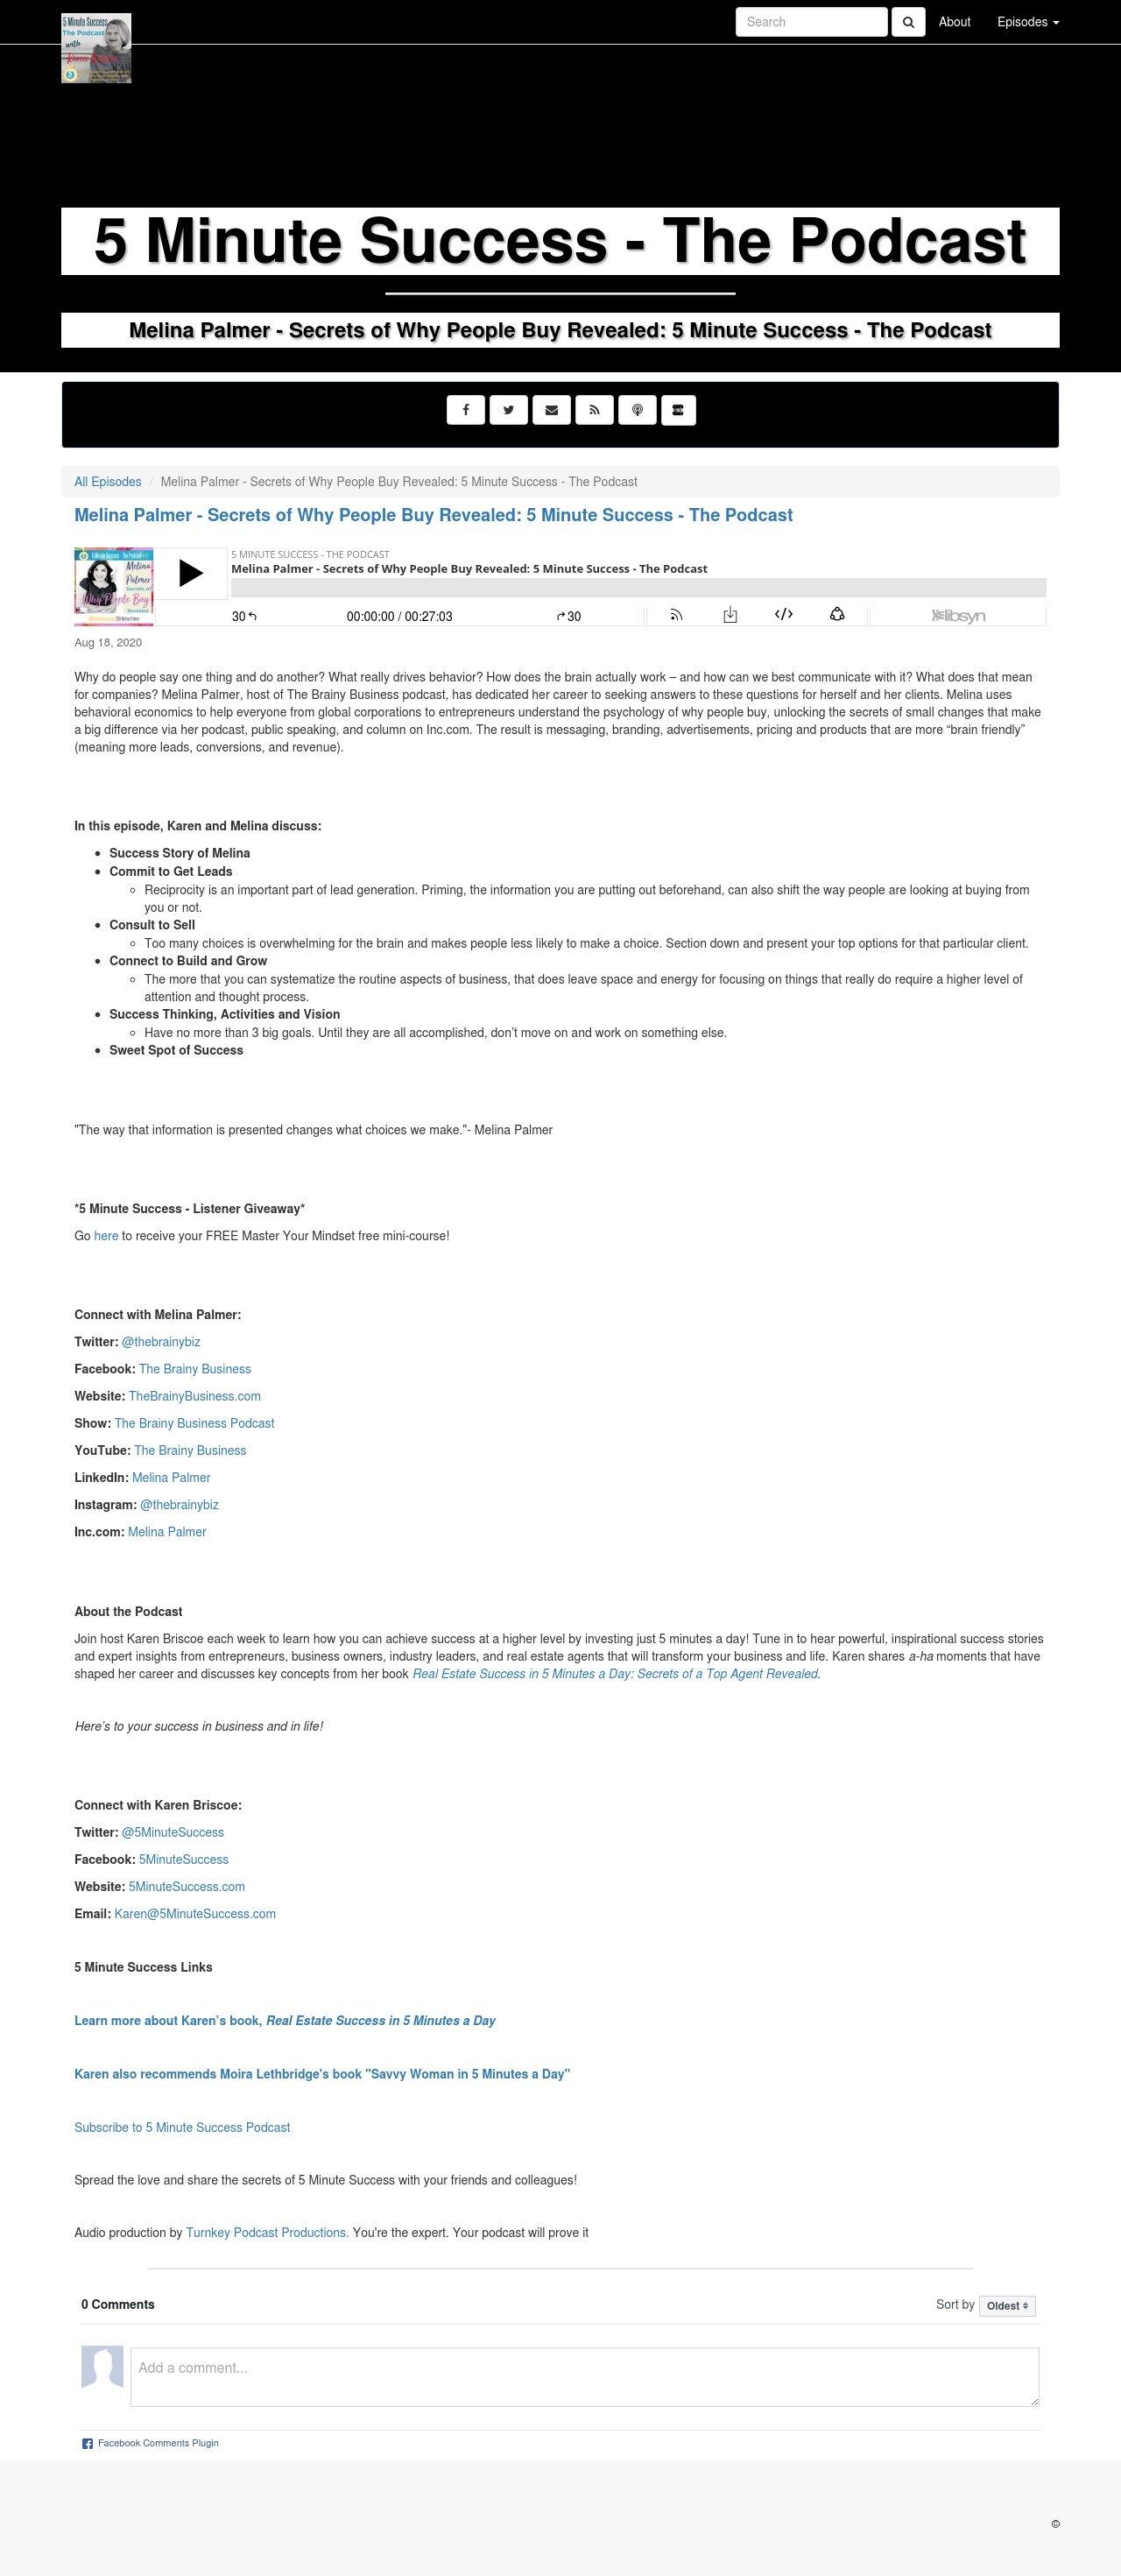 Libsyn.com (original post from client's host company)